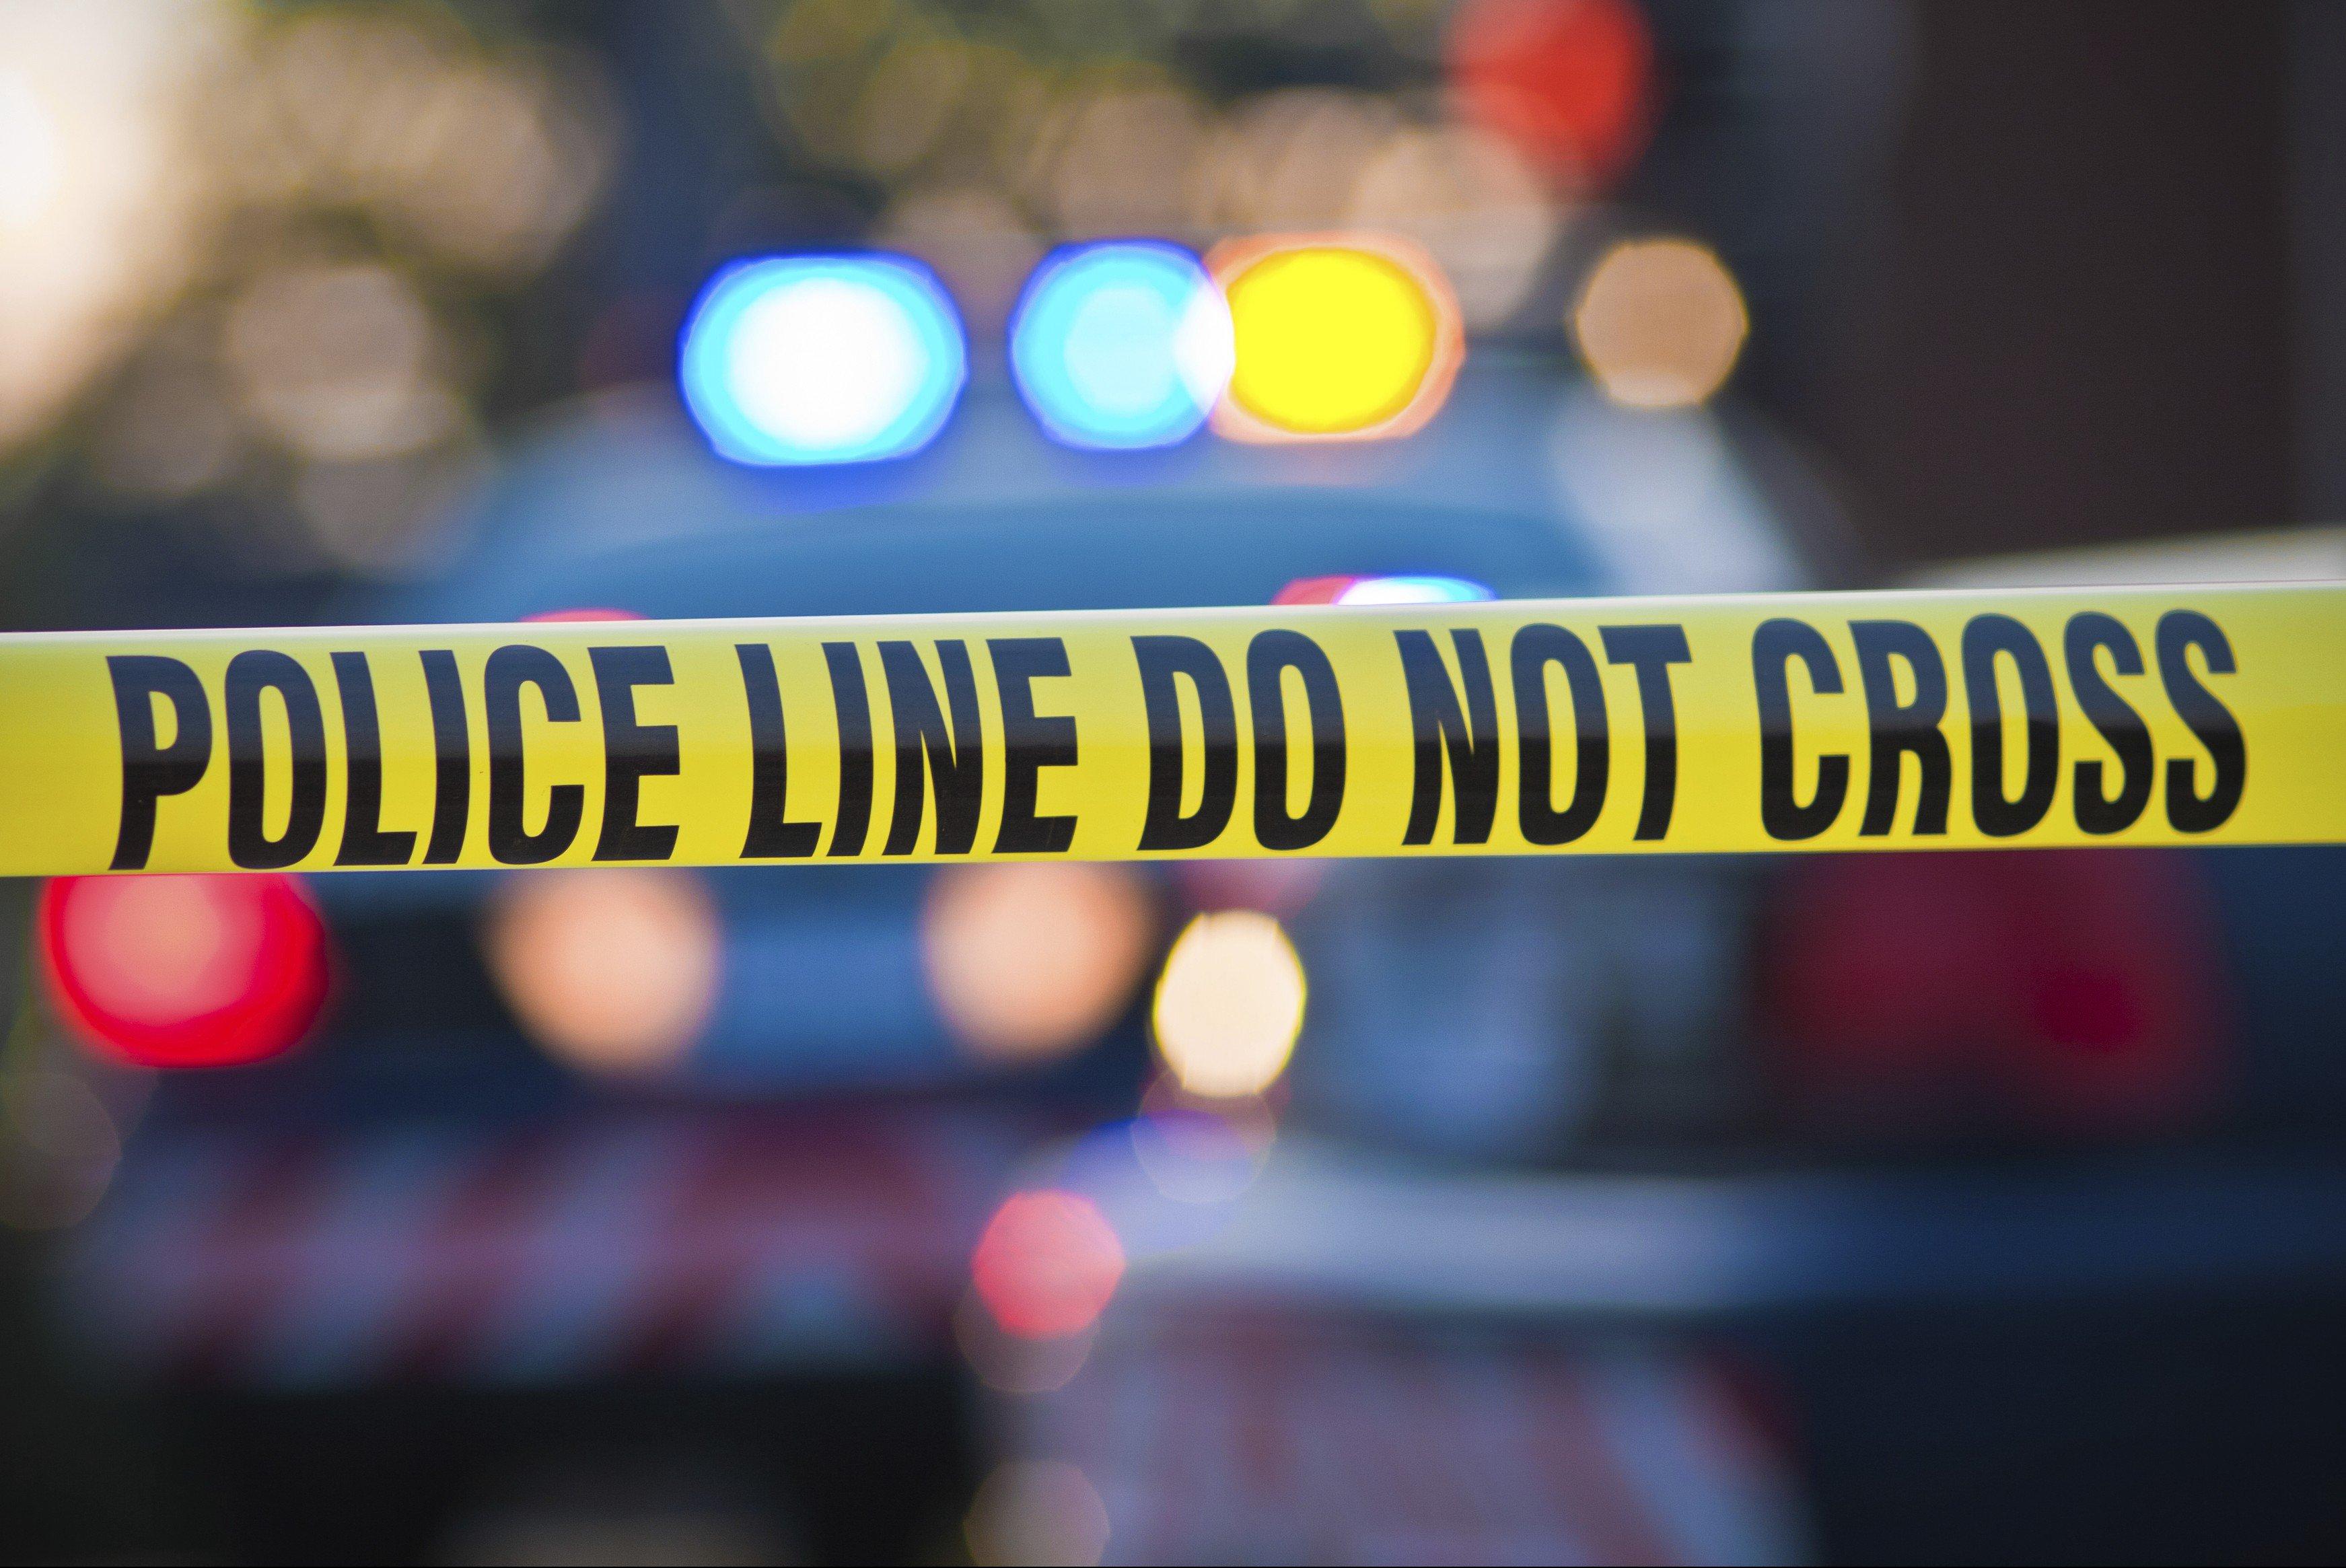 police-crime-tape-e1425658348437